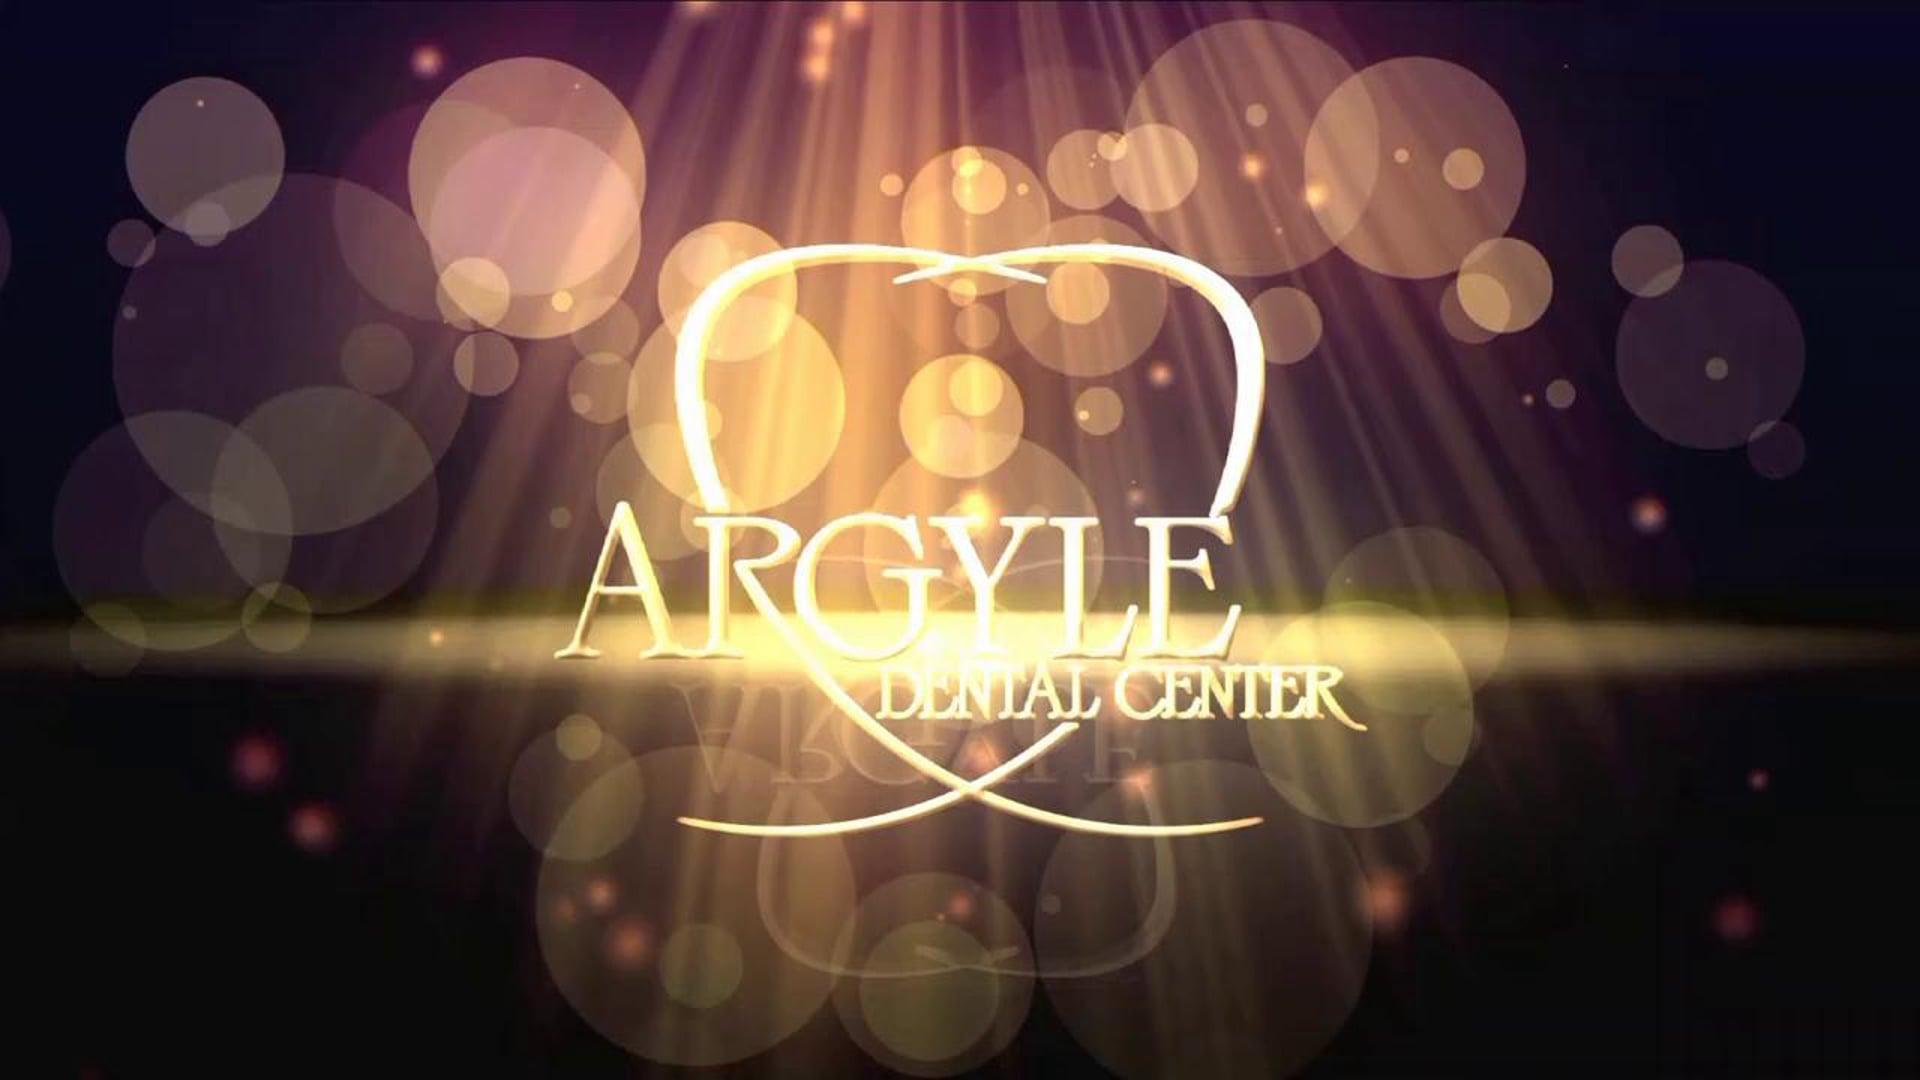 Argyle Dental Center - Your Smile - Dental Implants